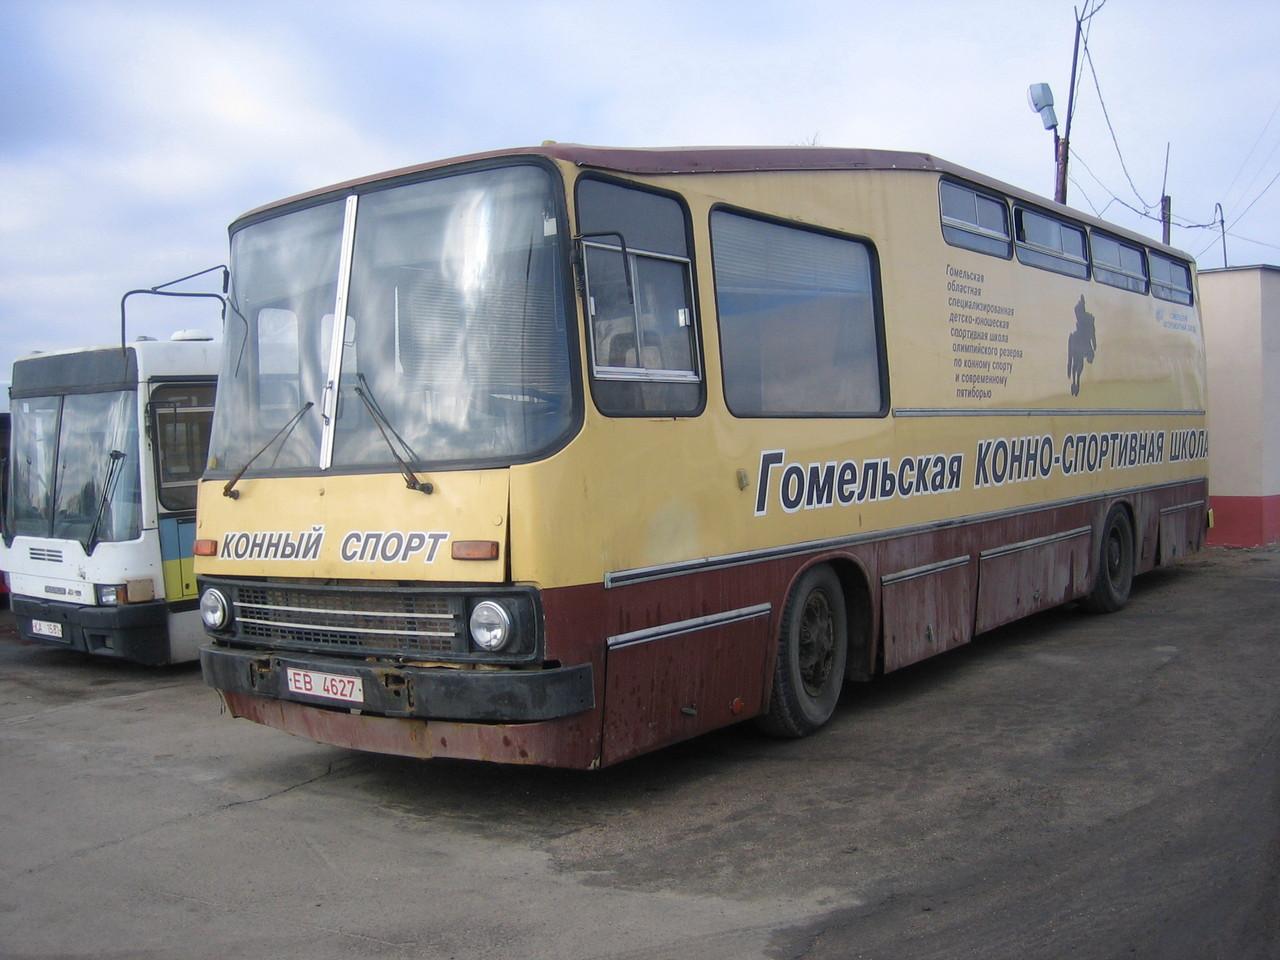 Автобус для перевозки лошадей на базе Ikarus 260. Минск. 02.04.2006